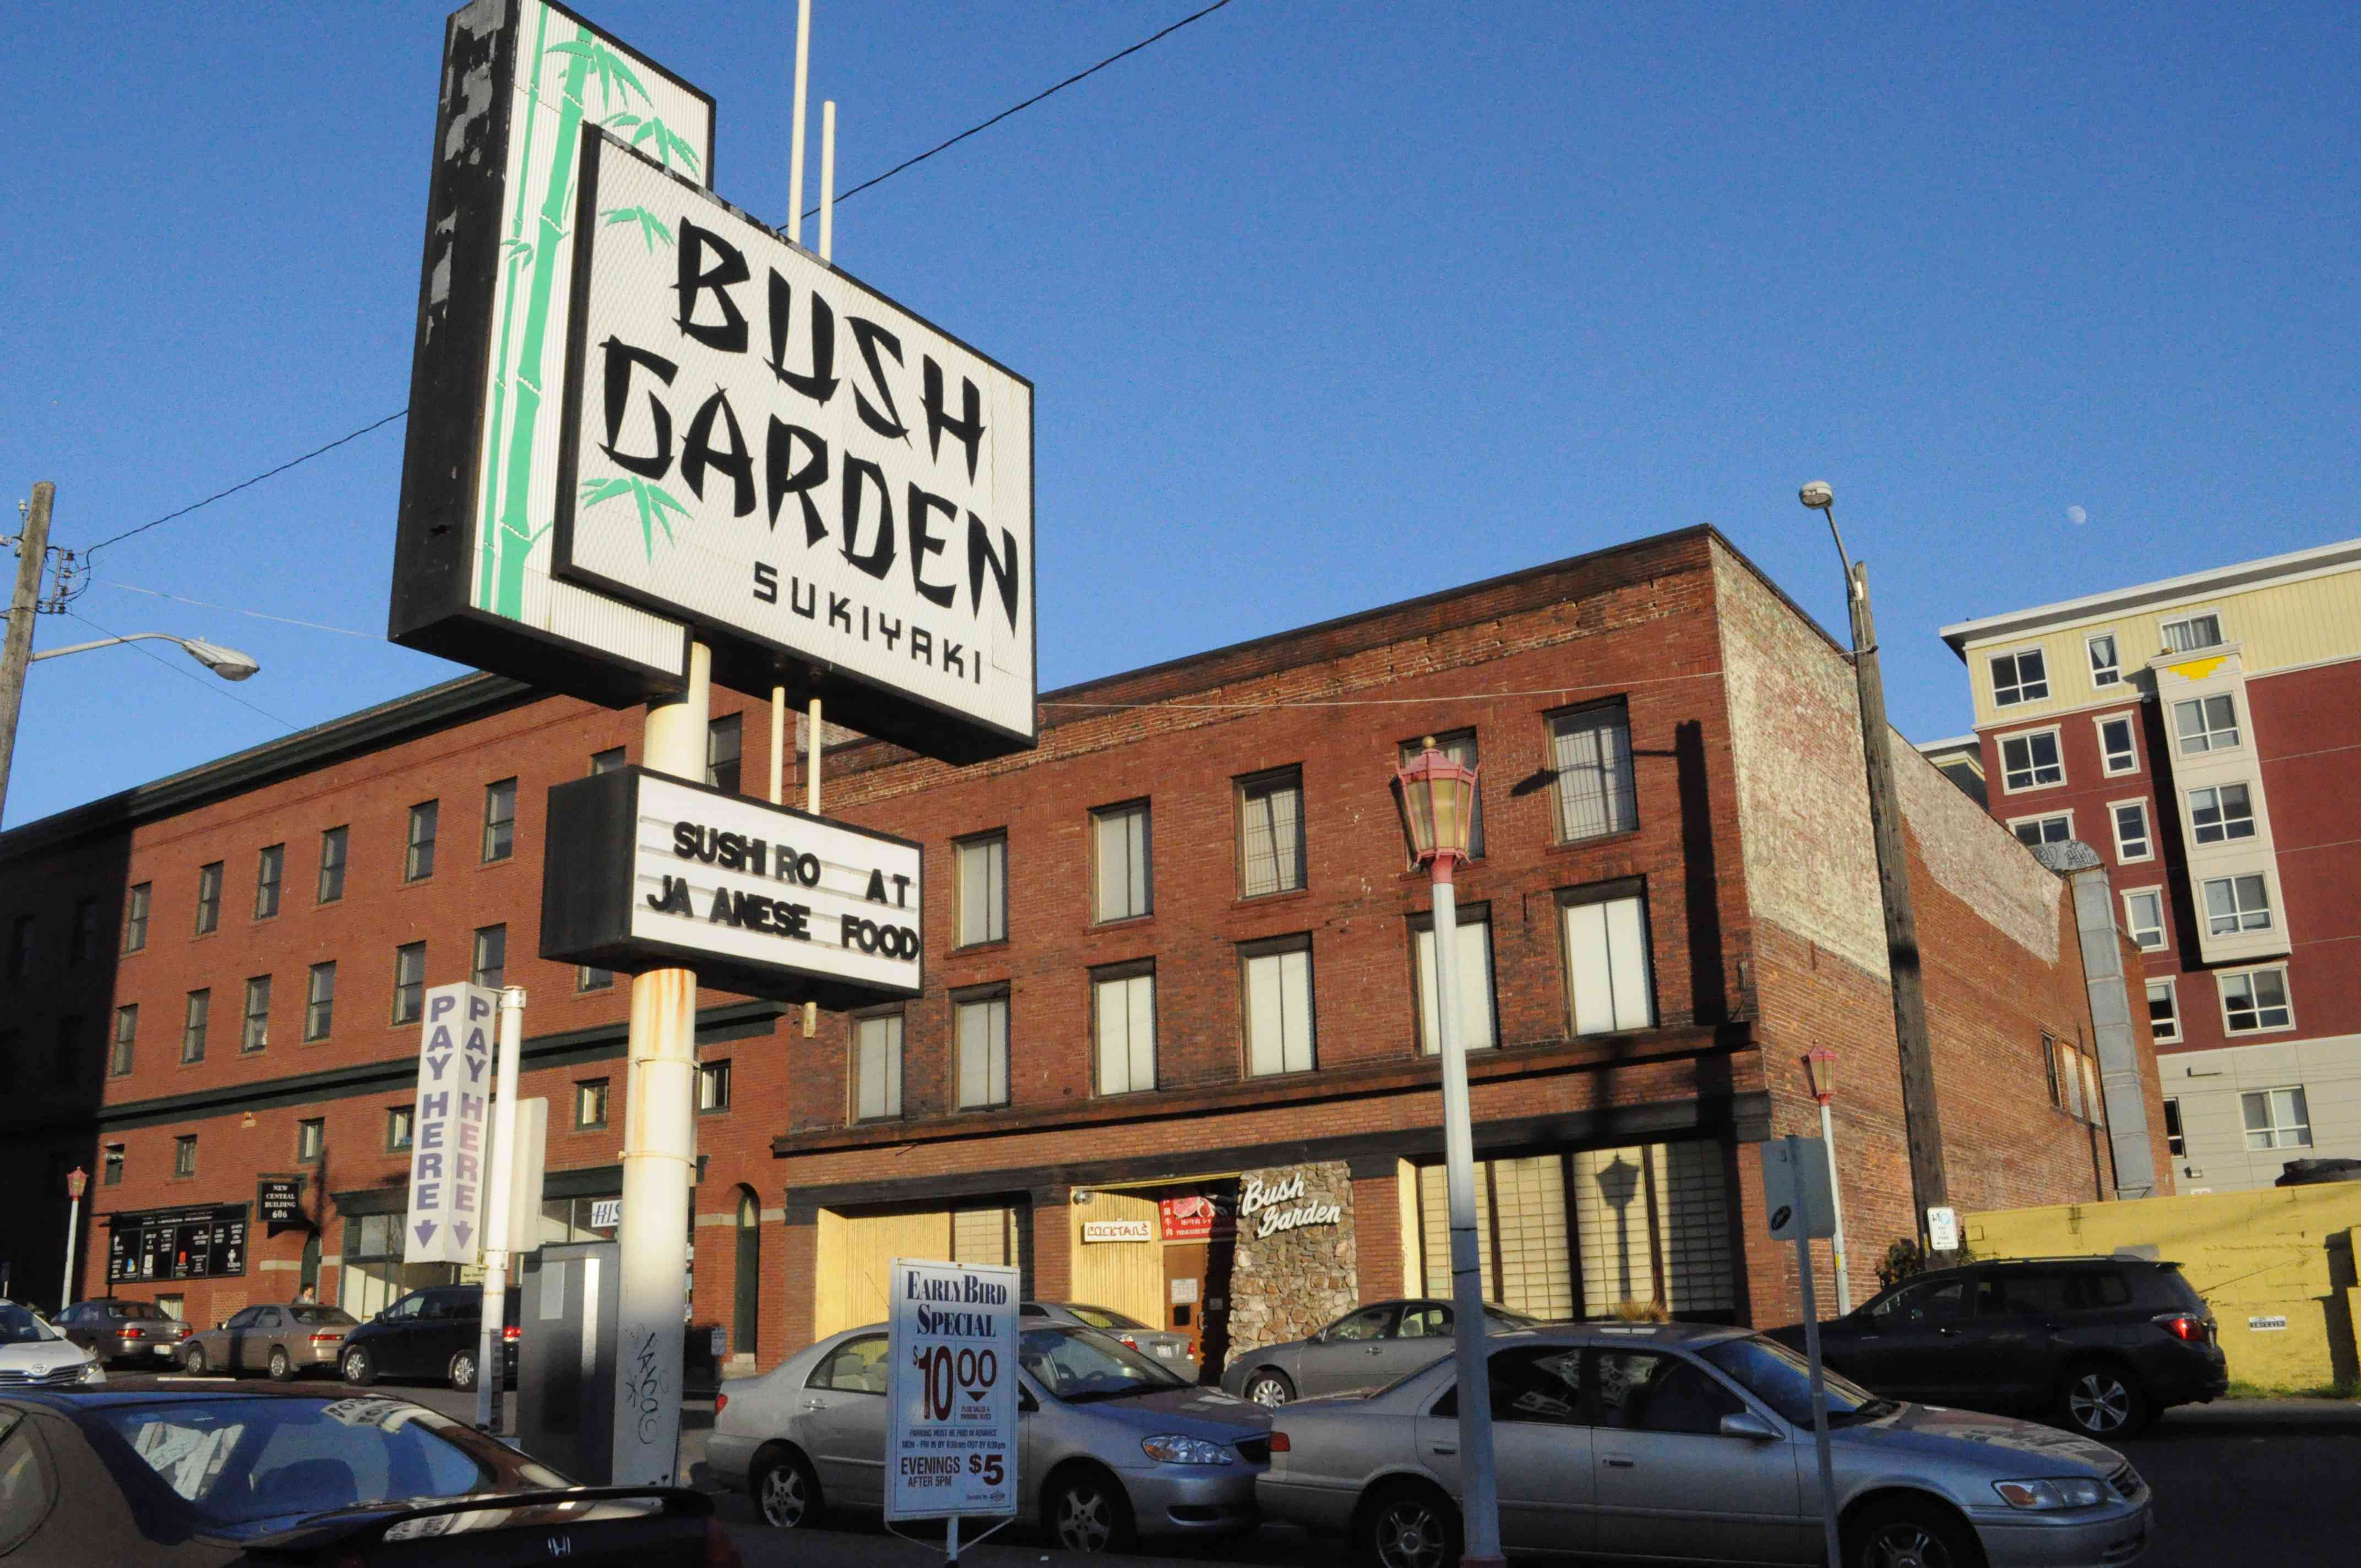 Bush Garden is a hotspot for karaoke